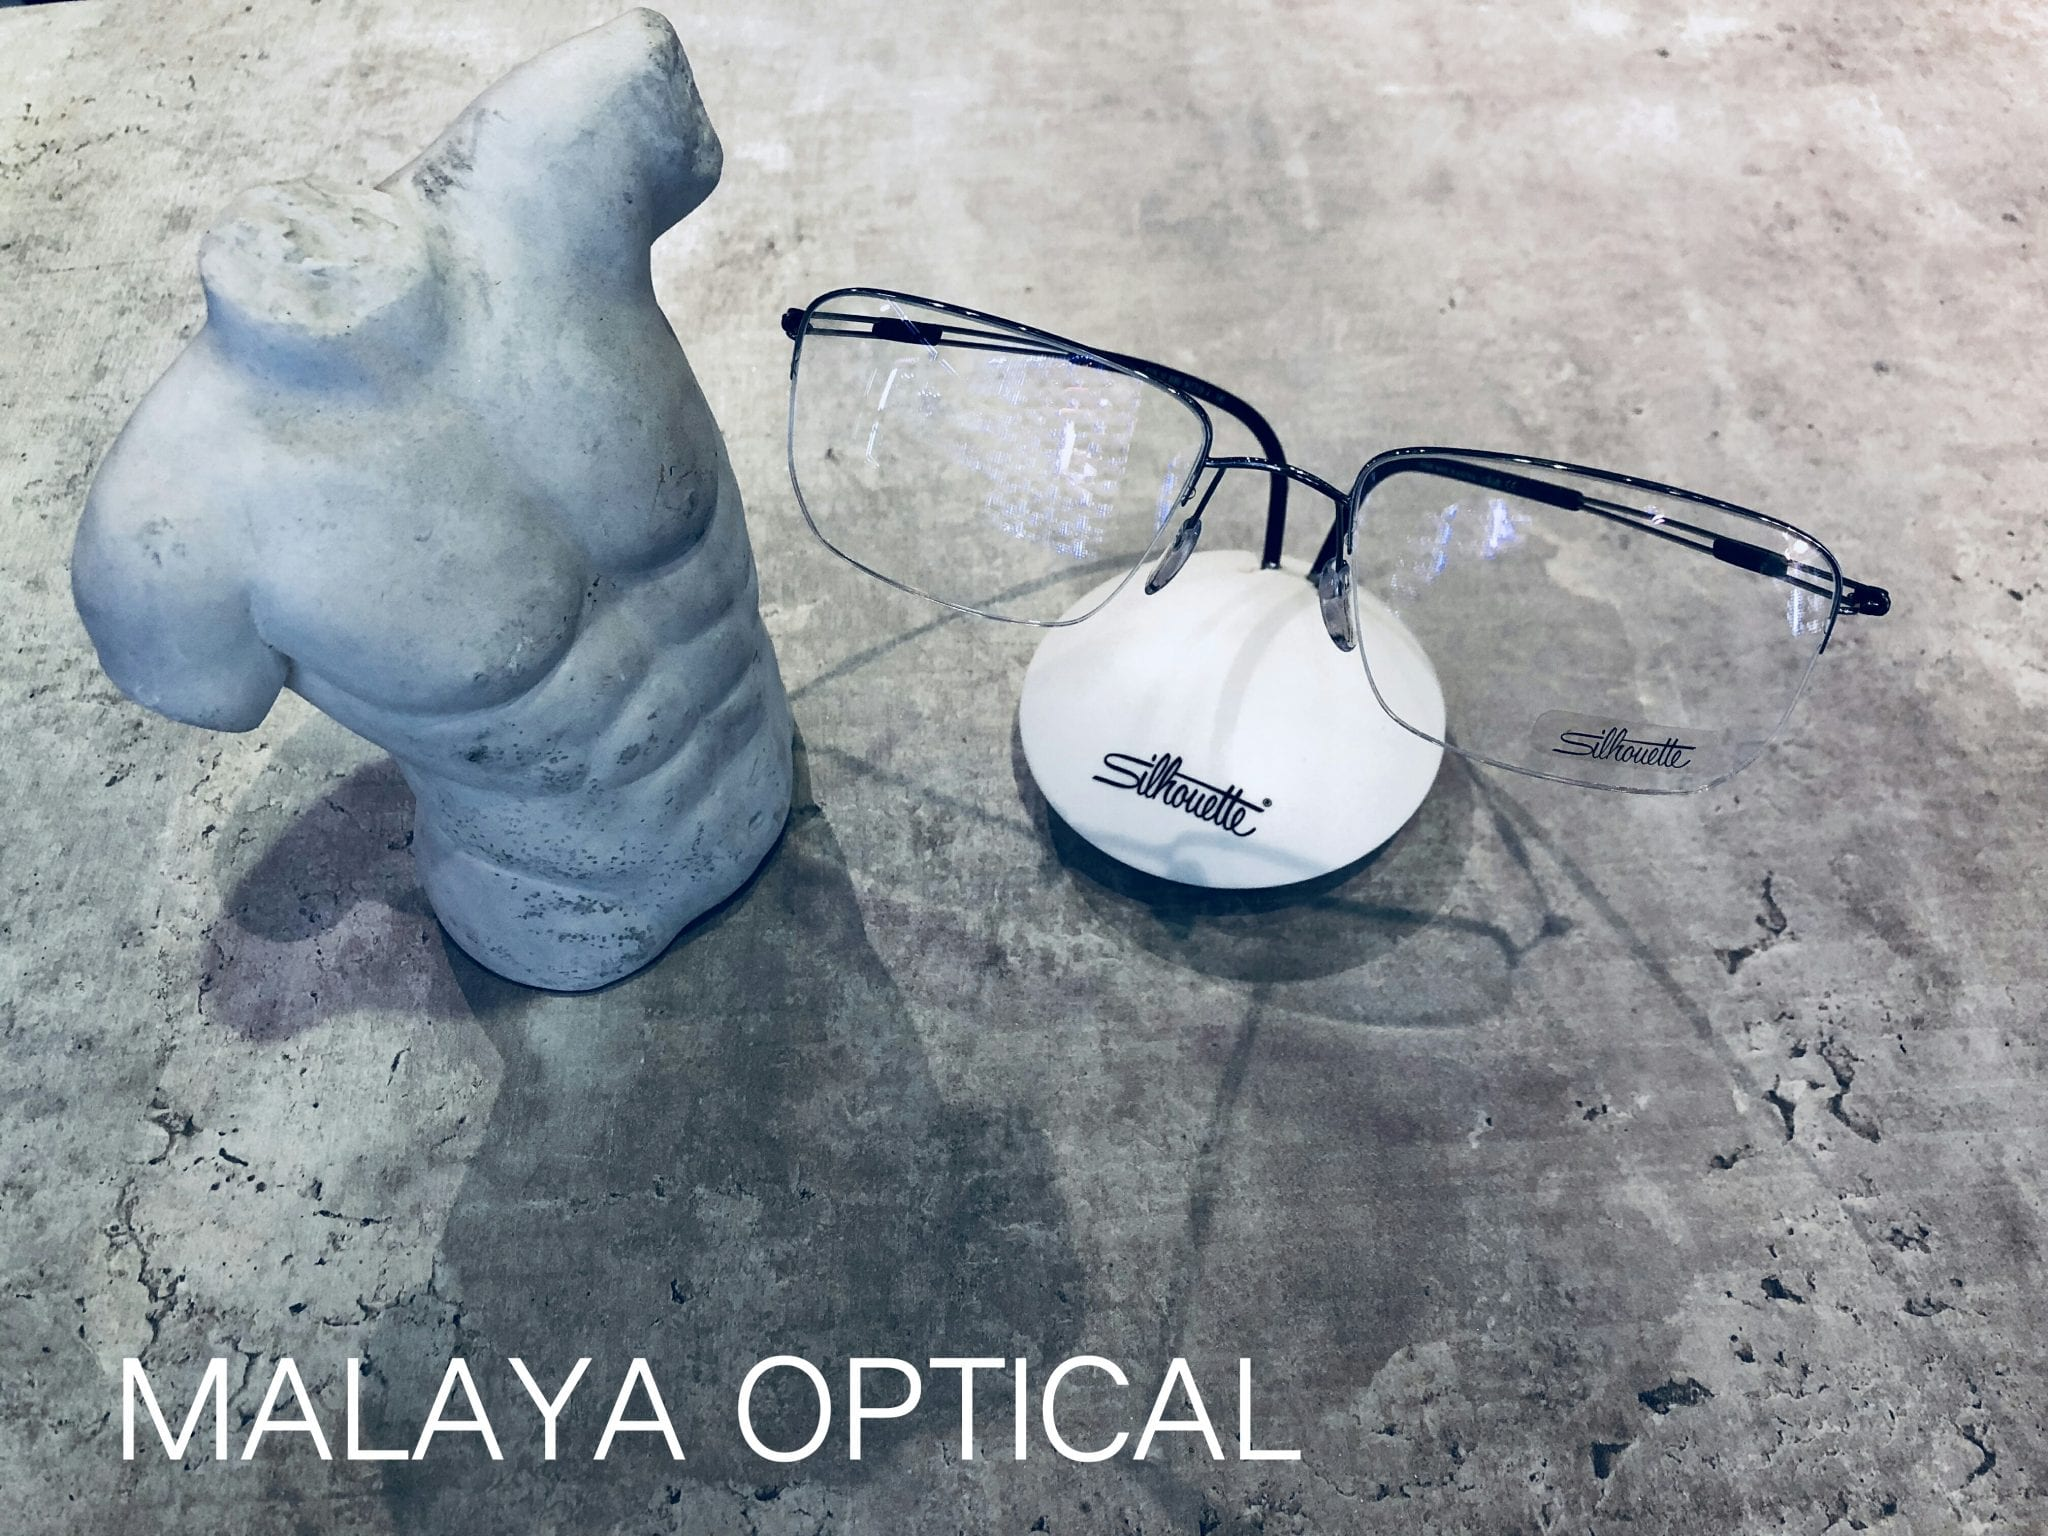 Silhouette Eyewear, Silhouette Eyewear, Optometrist in Petaling Jaya | Optical Shop